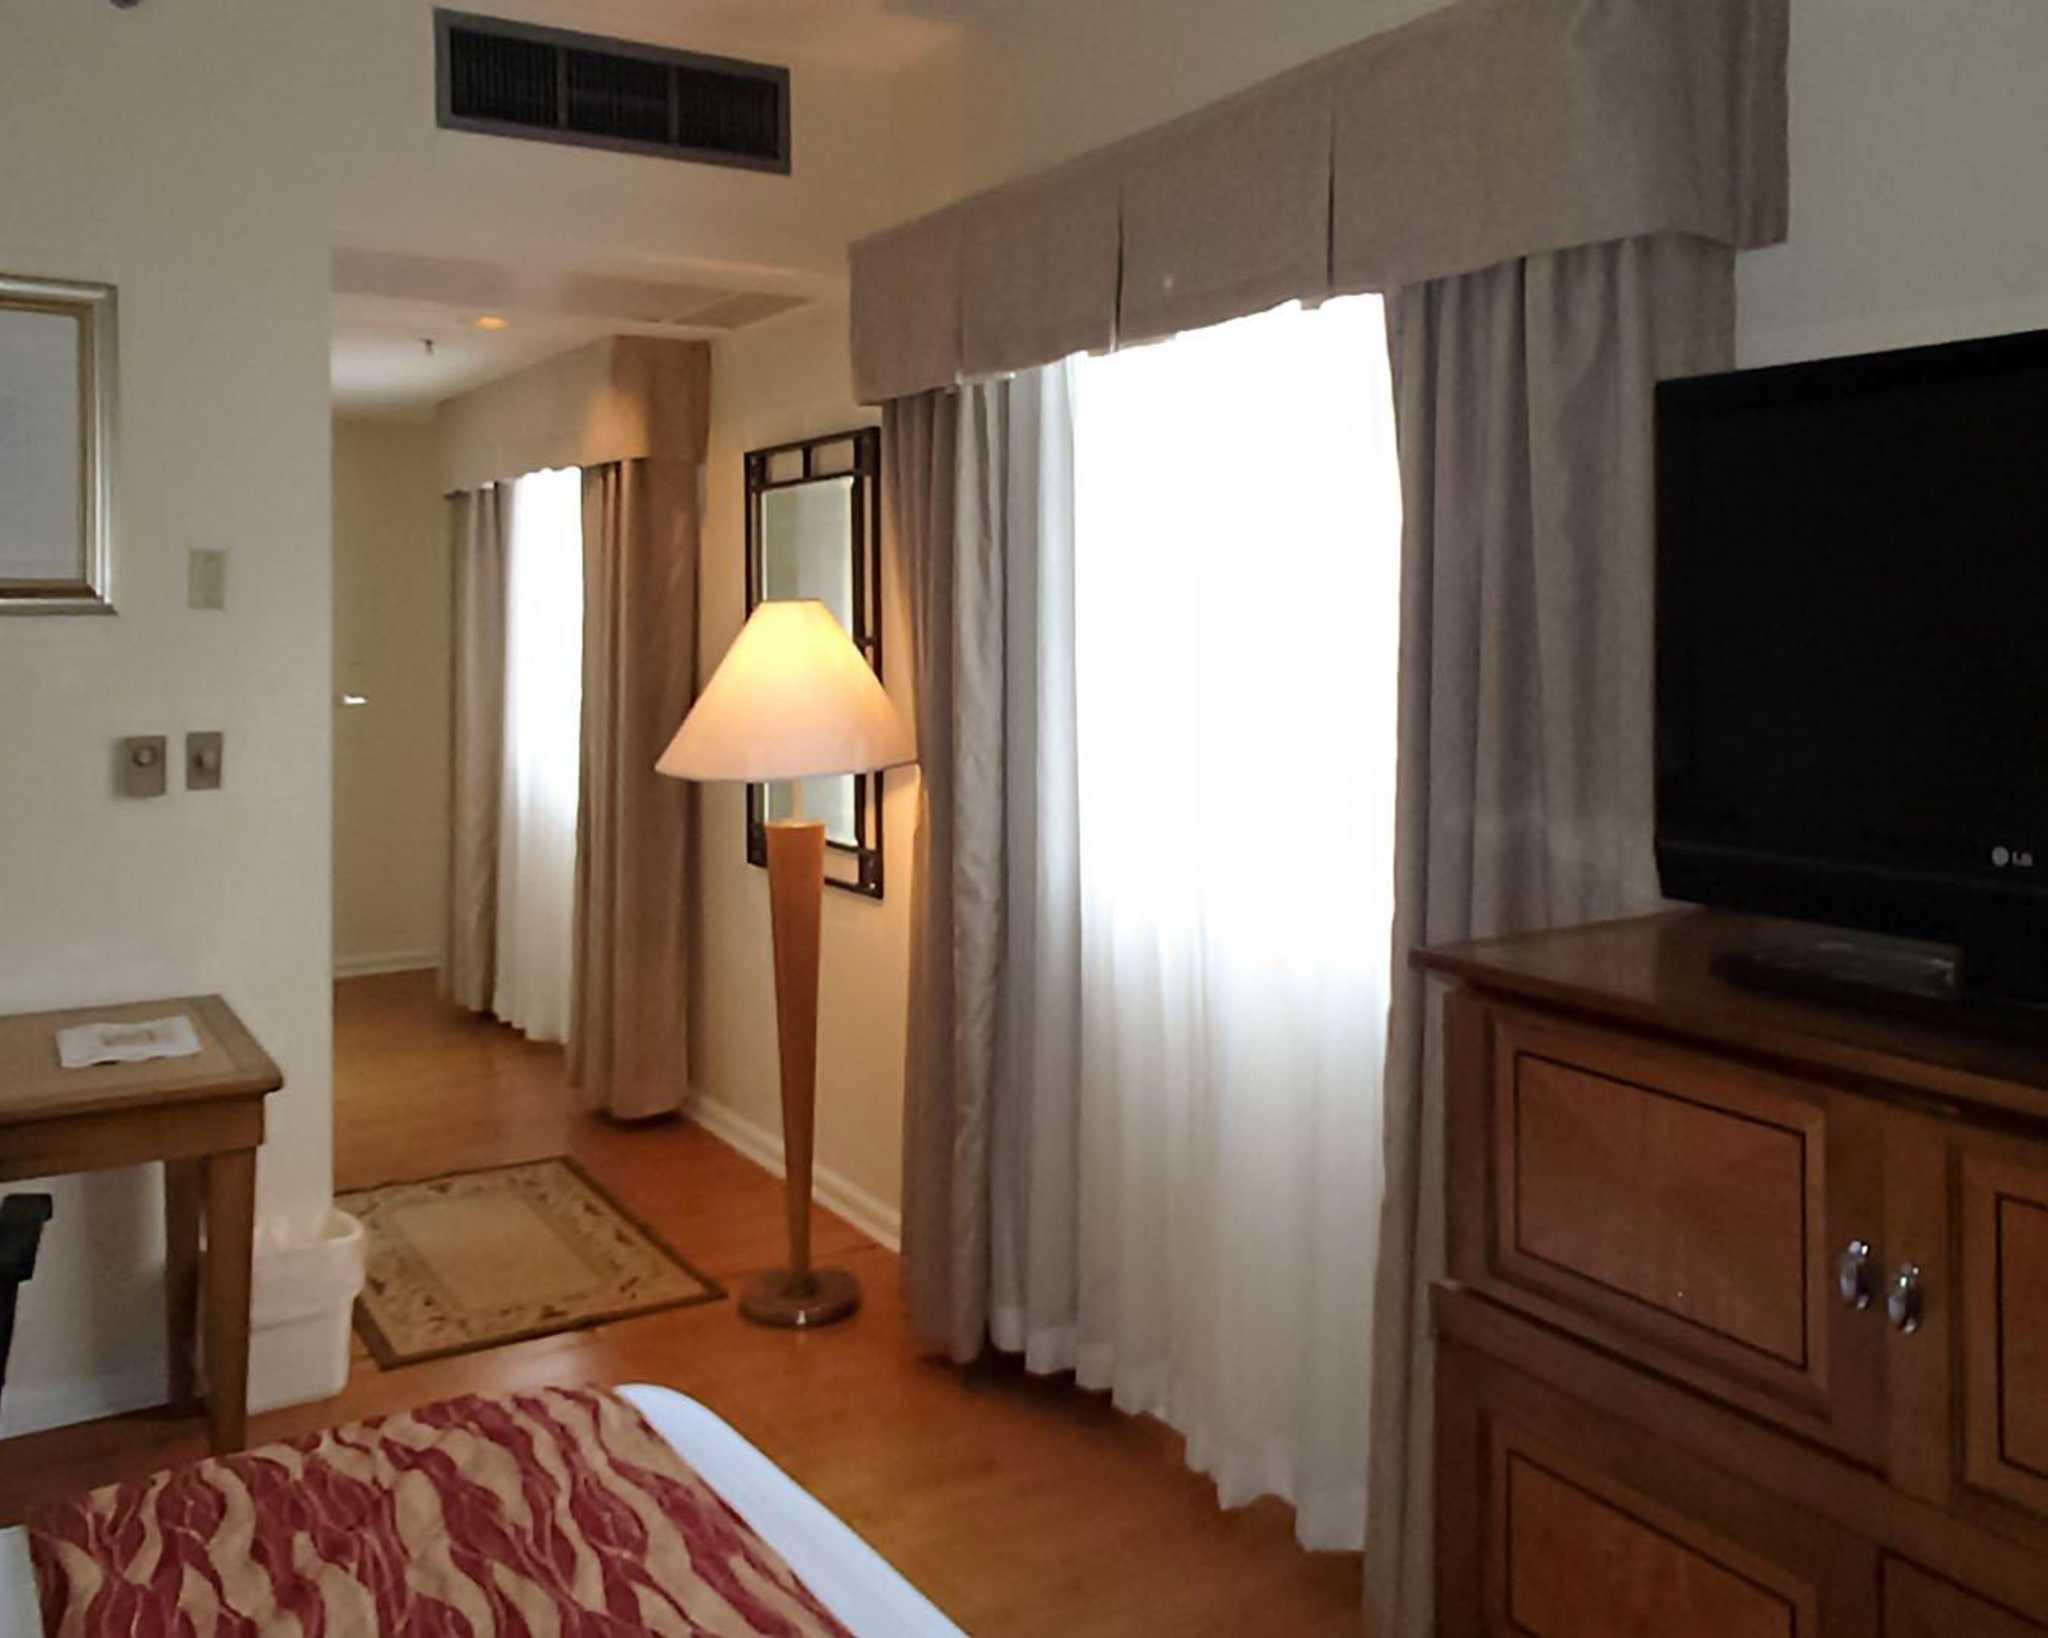 Rodeway Inn South Miami - Coral Gables image 7